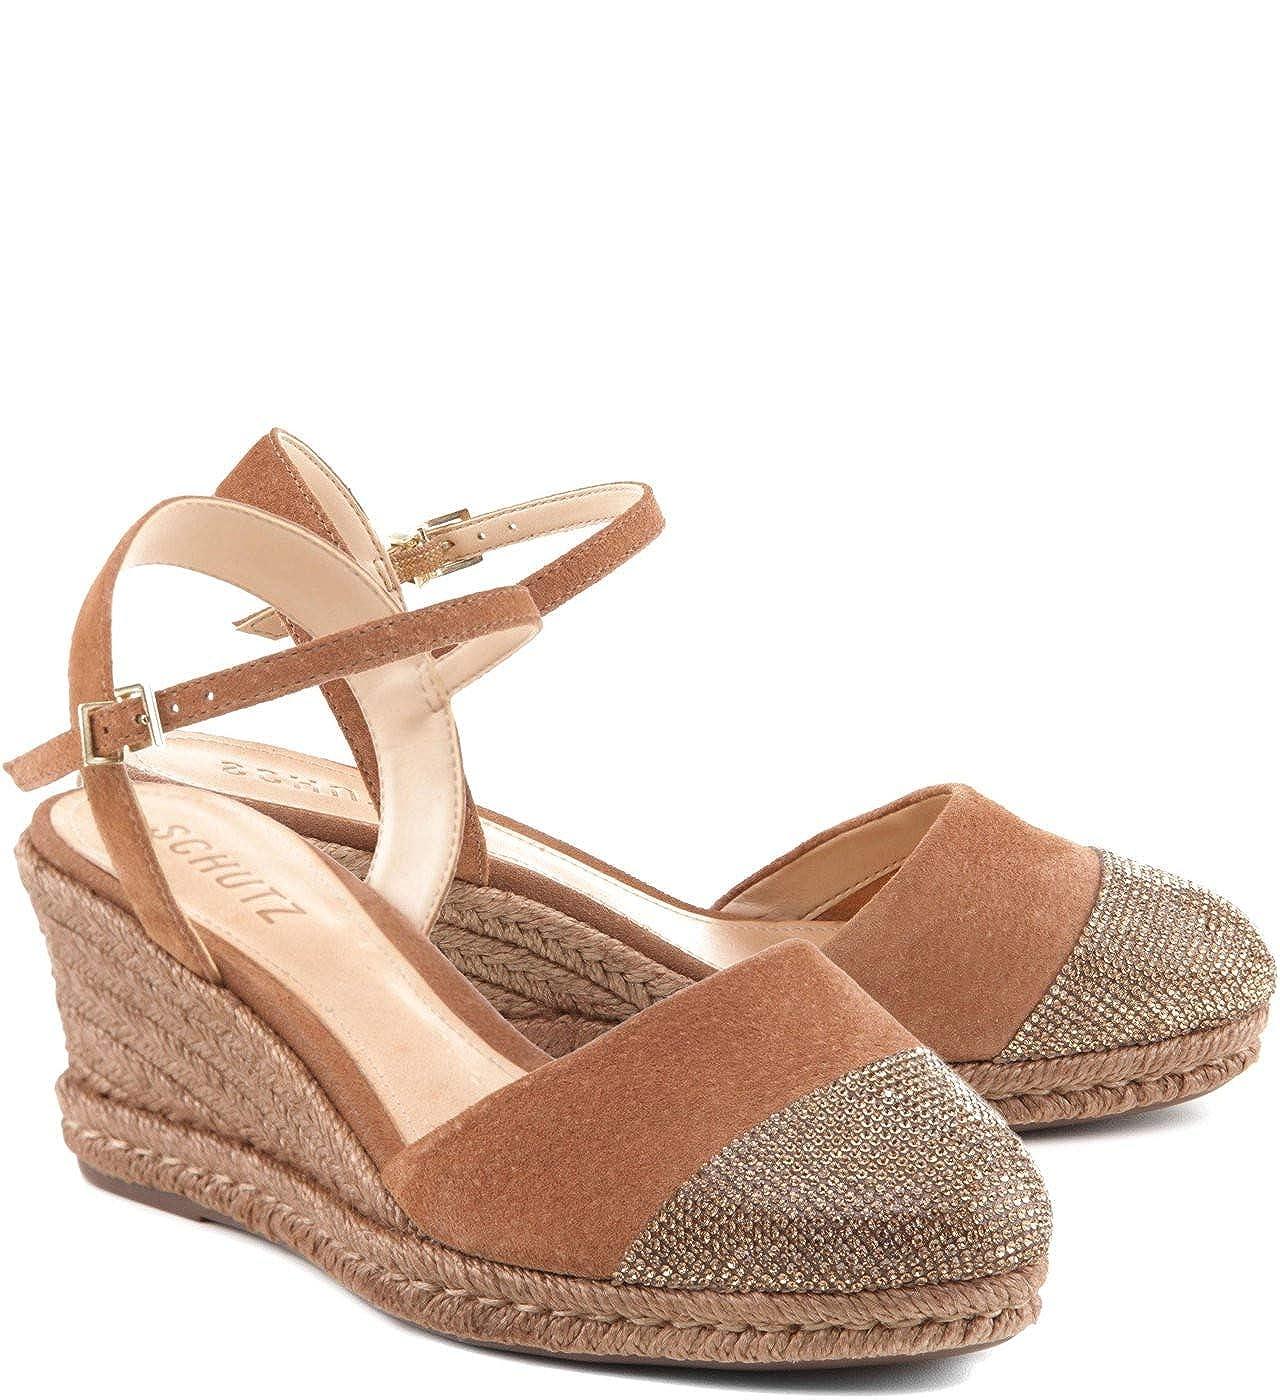 SCHUTZ Womens Fadri Dawn Tan Crystal Cap Toe Espadrille Wedge Pump Sandal